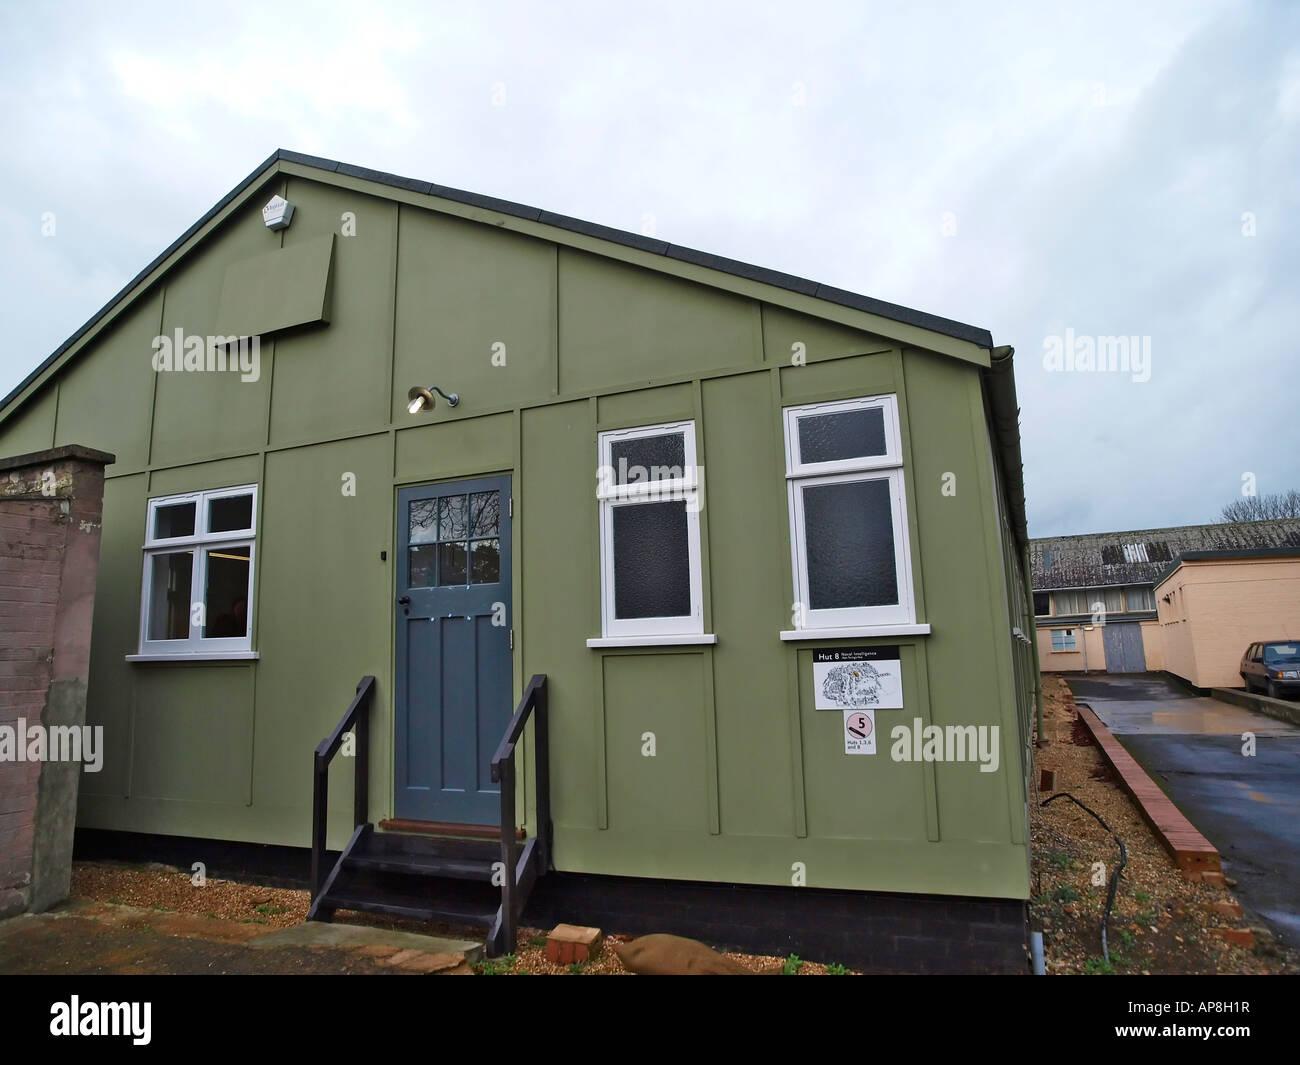 Hut 8 Naval Intelligence, where Alan Turing worked, Bletchley Park, Bletchley, Milton Keynes, MK3 6EB - Stock Image